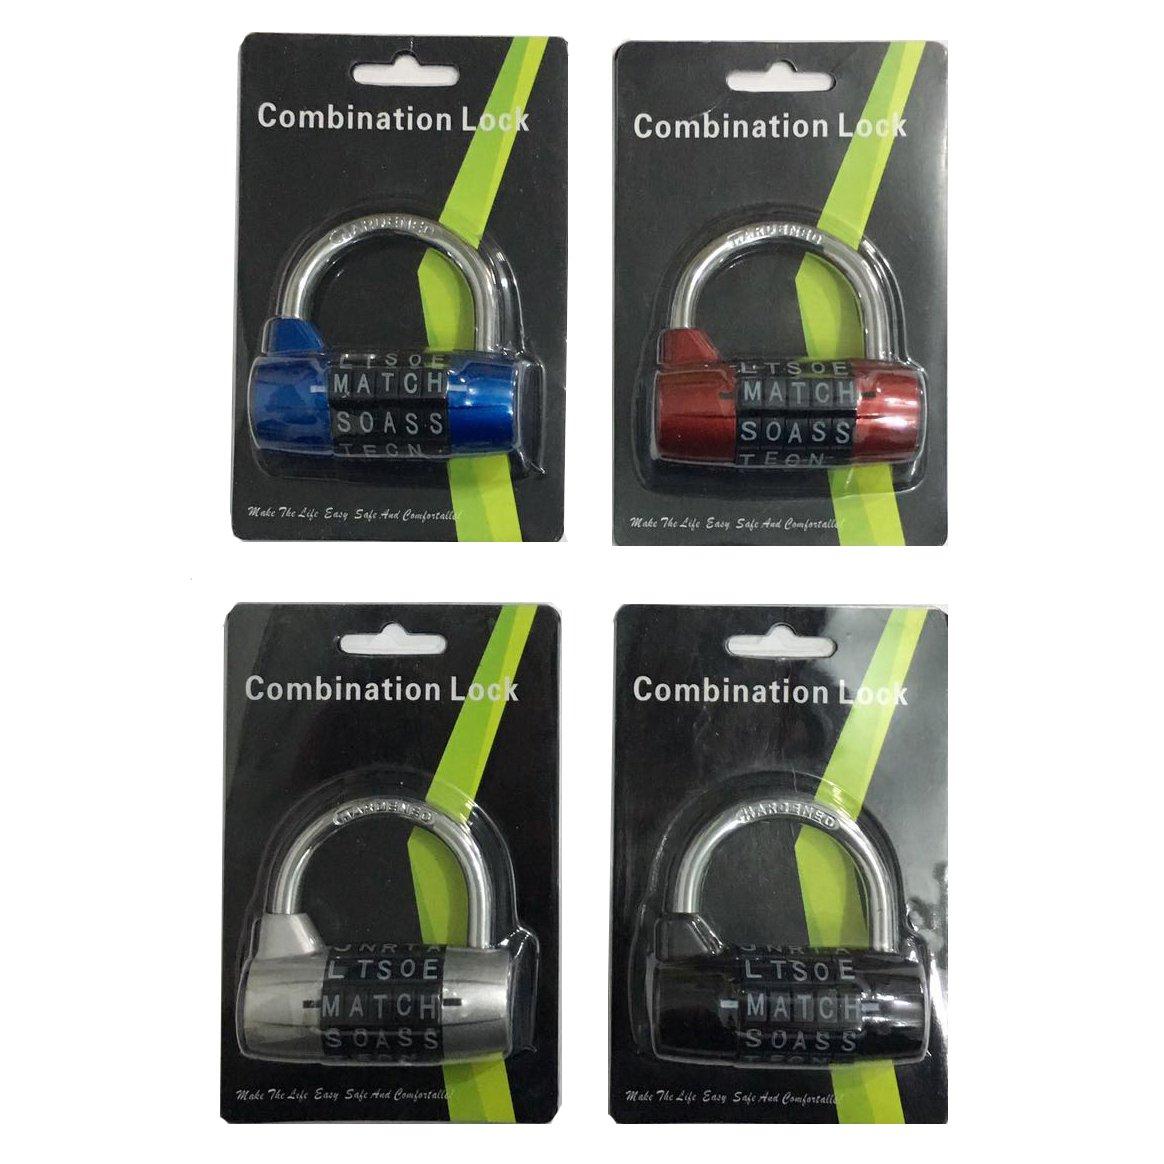 5 Letters Lock Code Lock Large Gym Cabinet Locker Room Prop Padlock Wordlock PL-004-BK 5-Dial Combination Padlock Black